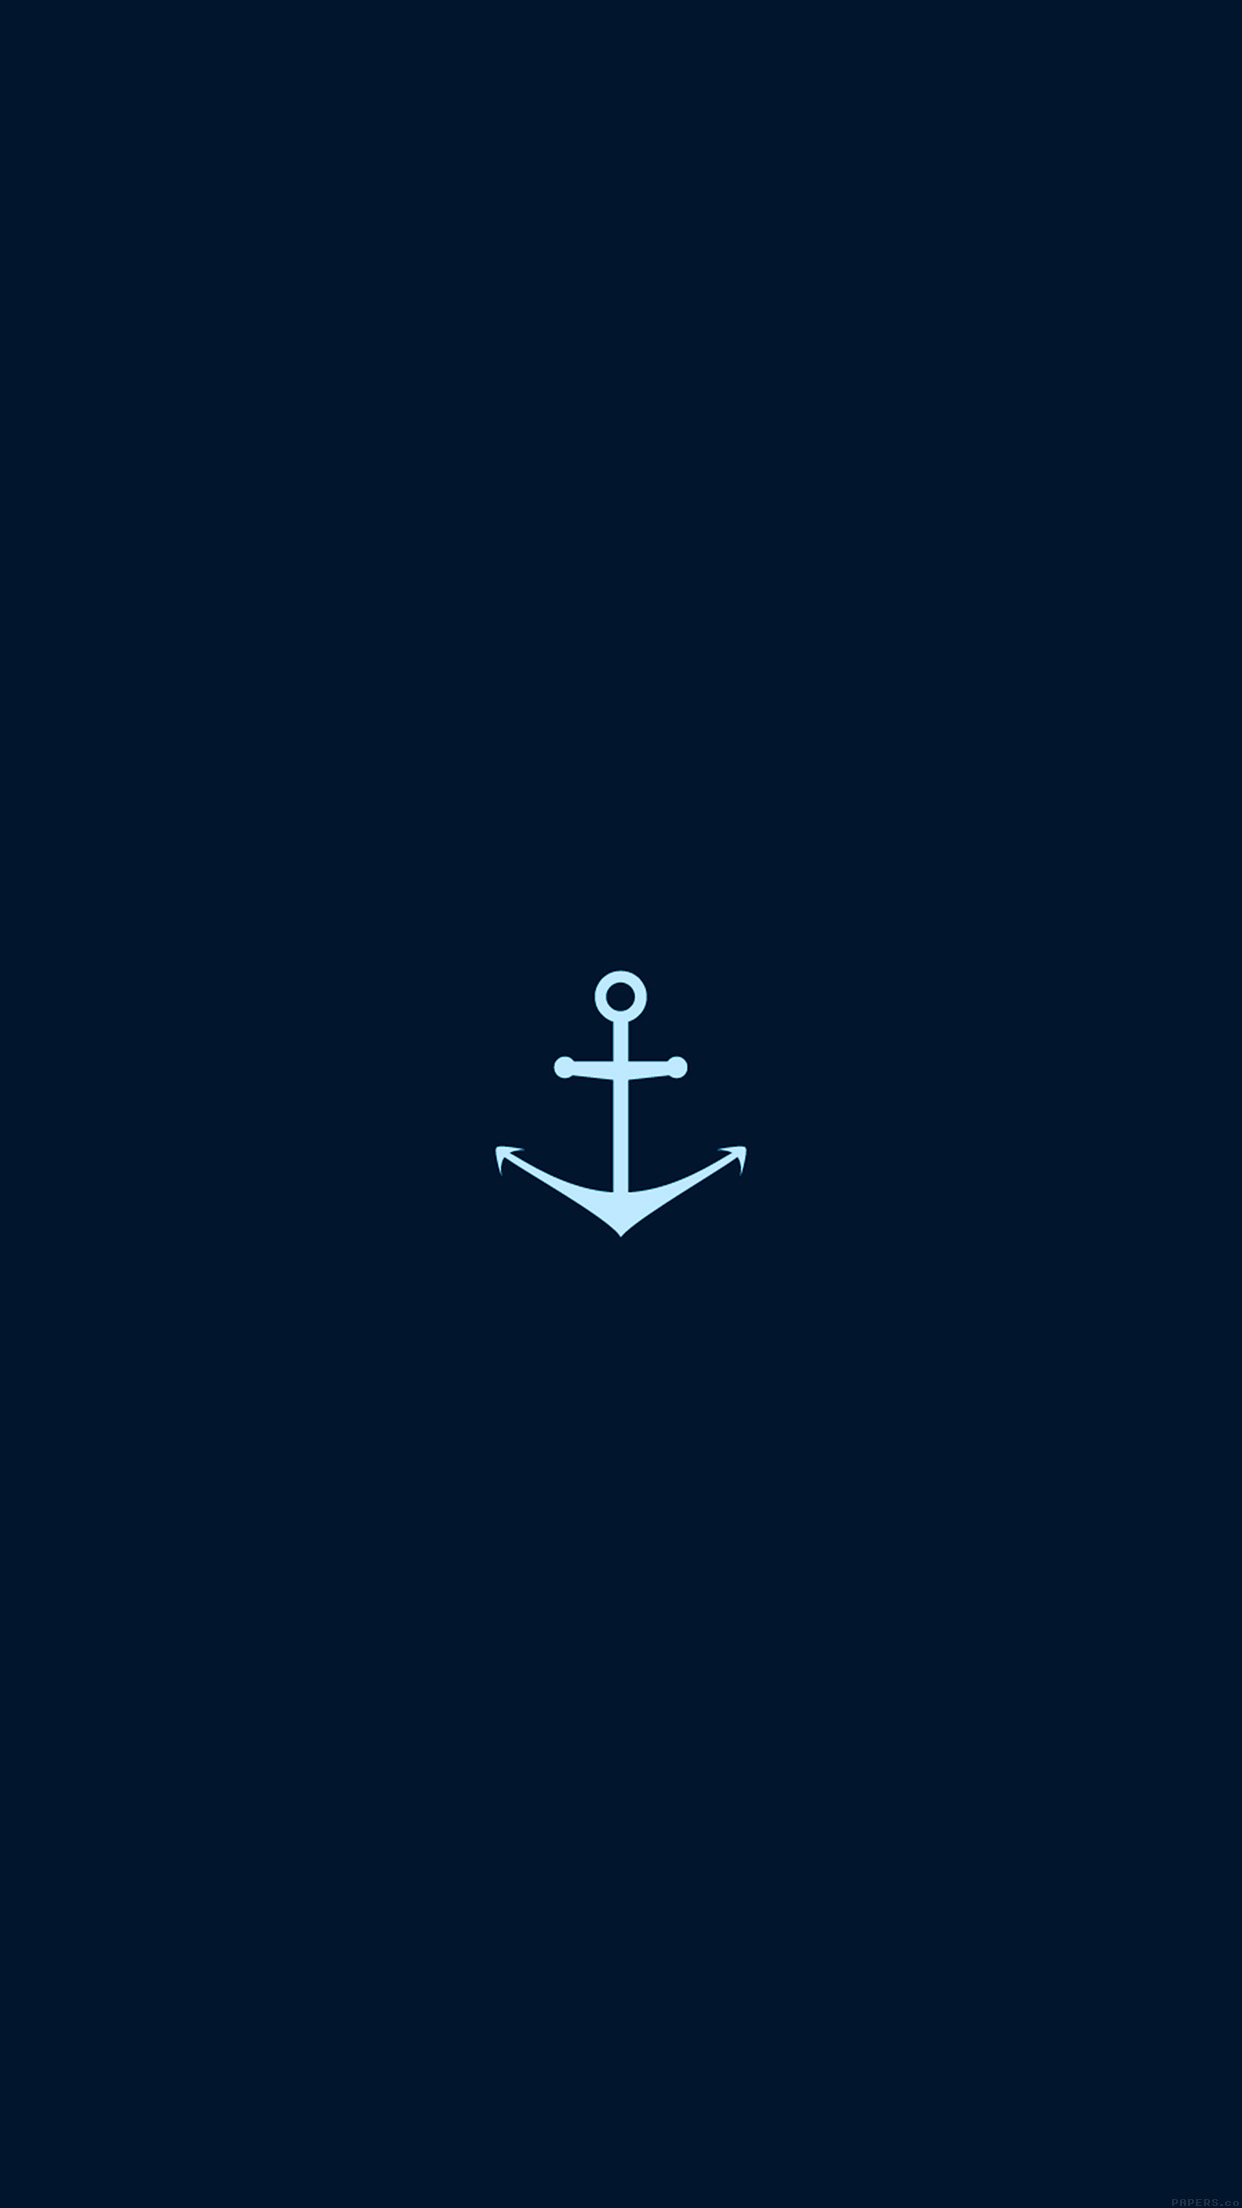 Chevron Iphone 5 Wallpaper Ah28 Minimal Sea Anchor Logo Blue Art Papers Co